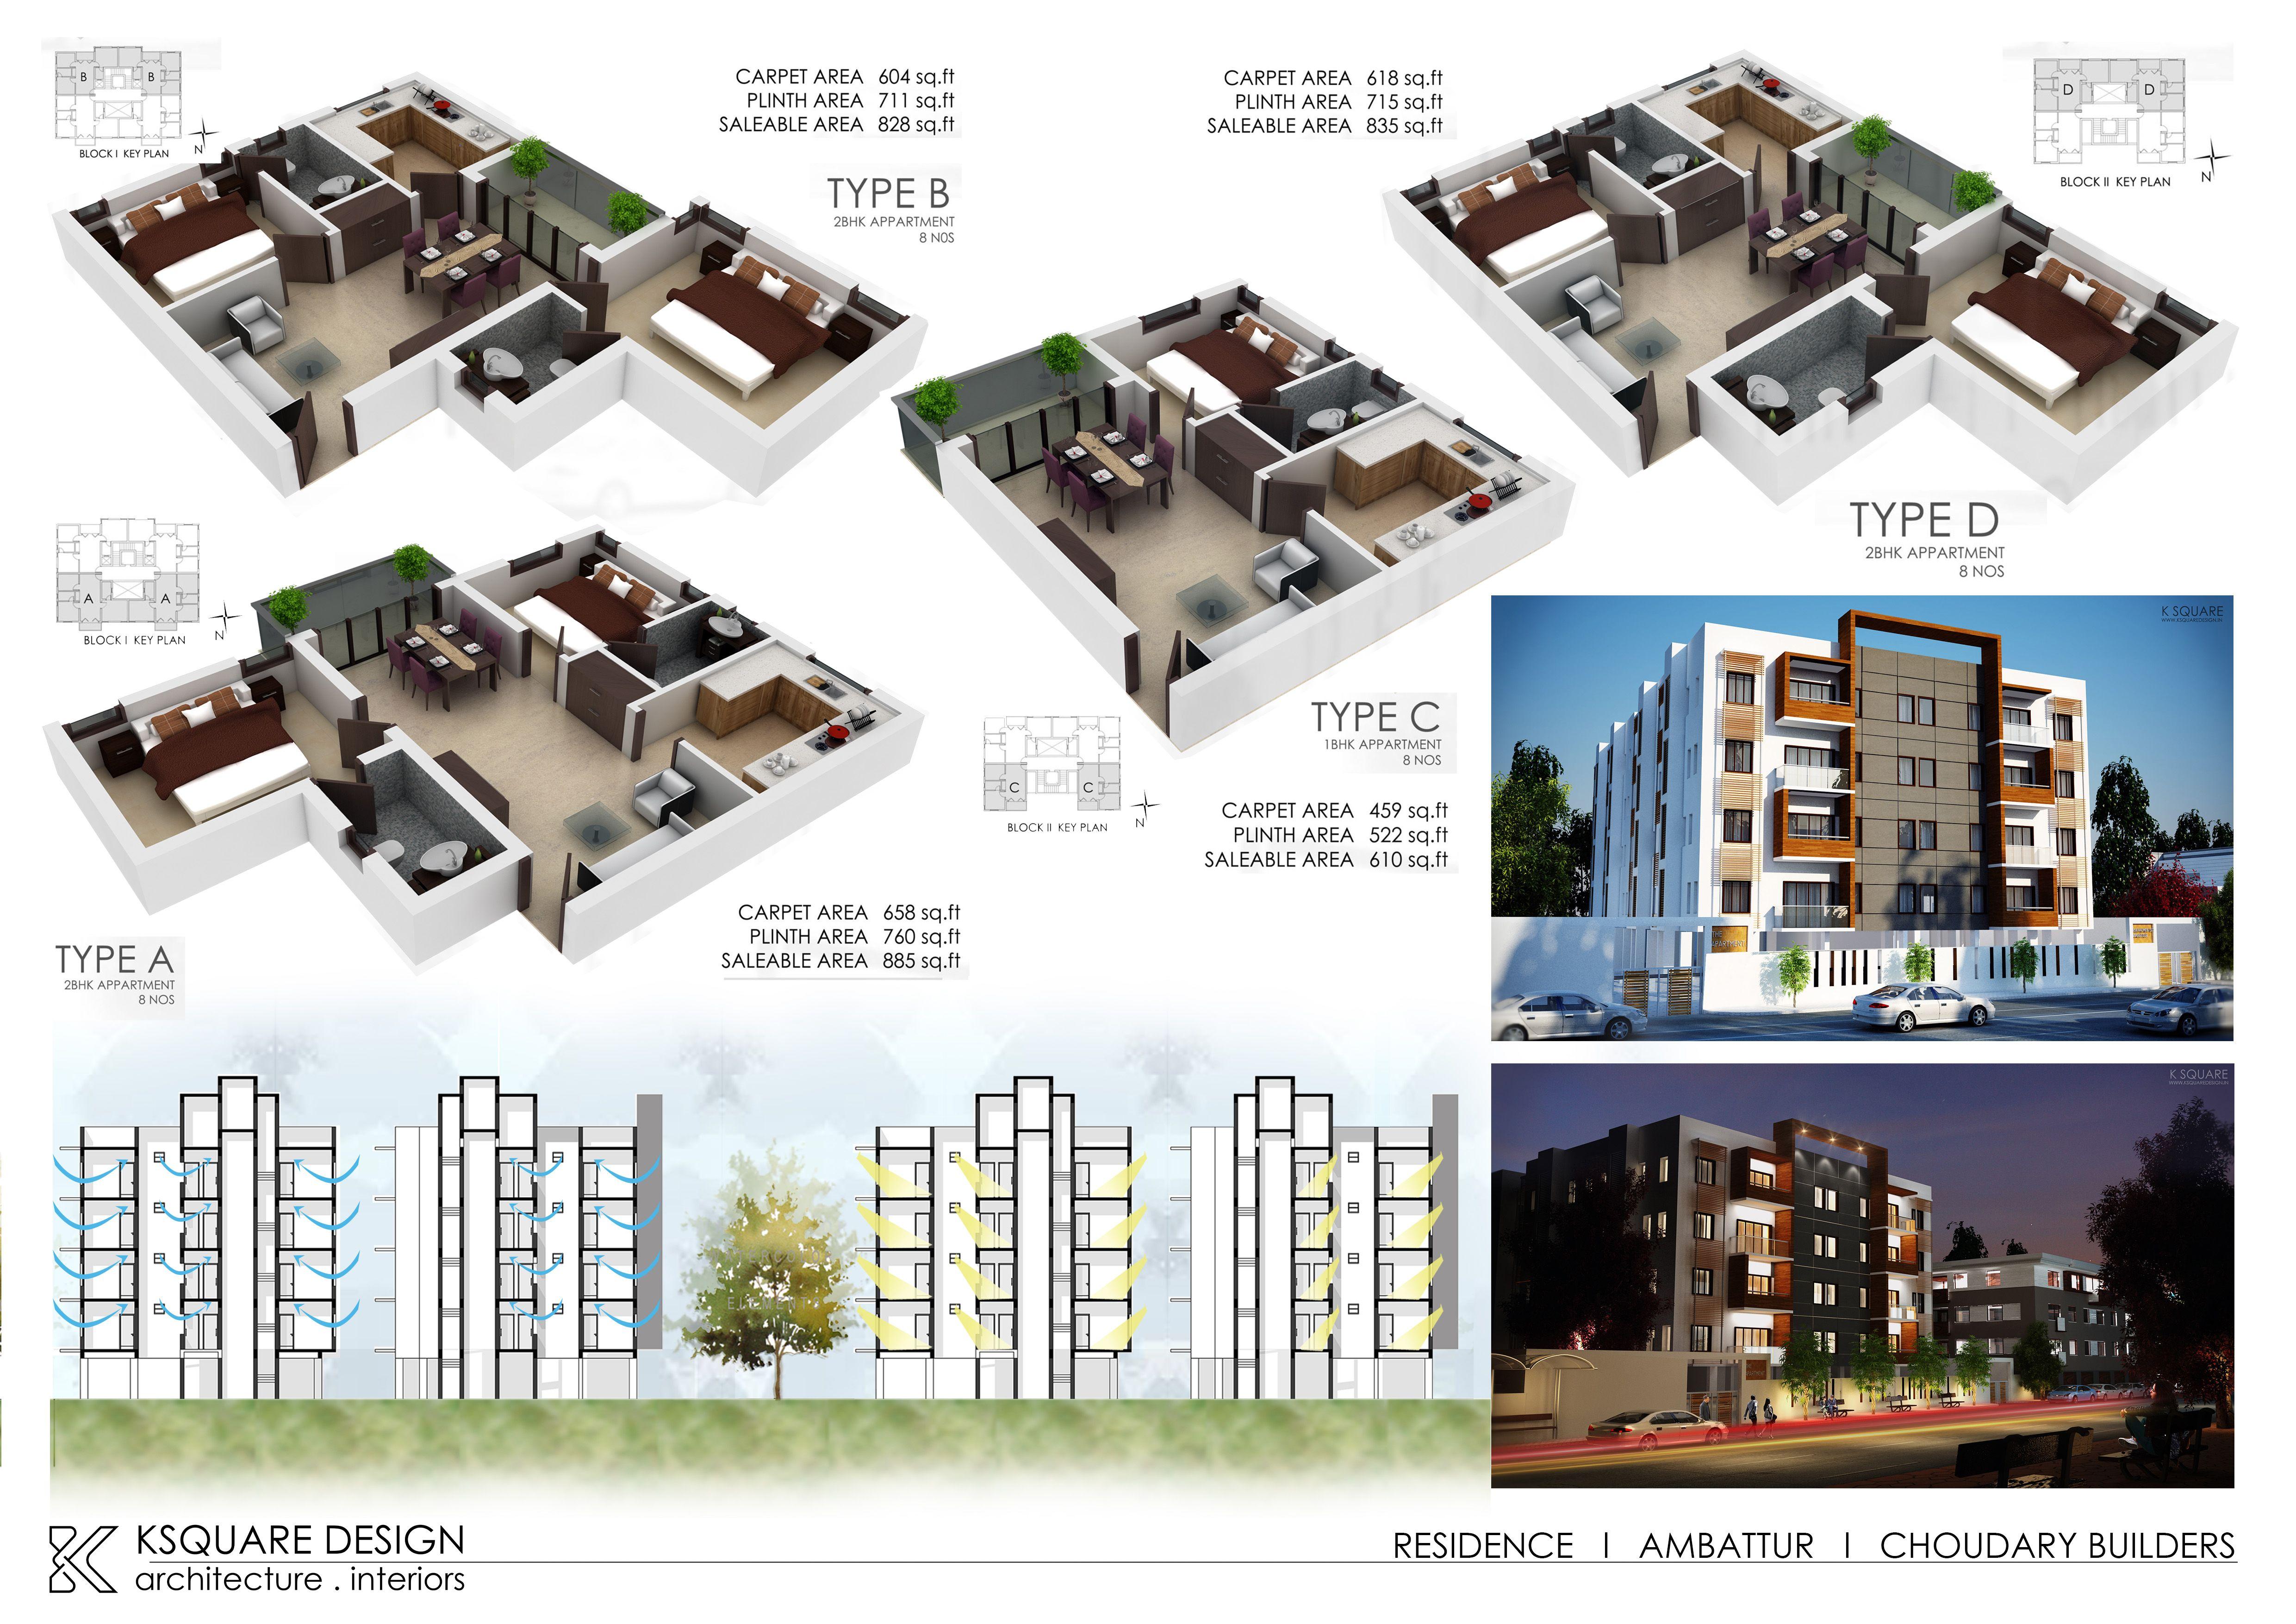 Multi Dwelling Unit For Choudary Builders Ambattur Chennai Designed By K Square Architects Interior 91 9677099960 Www Ksqu Architect Design The Unit